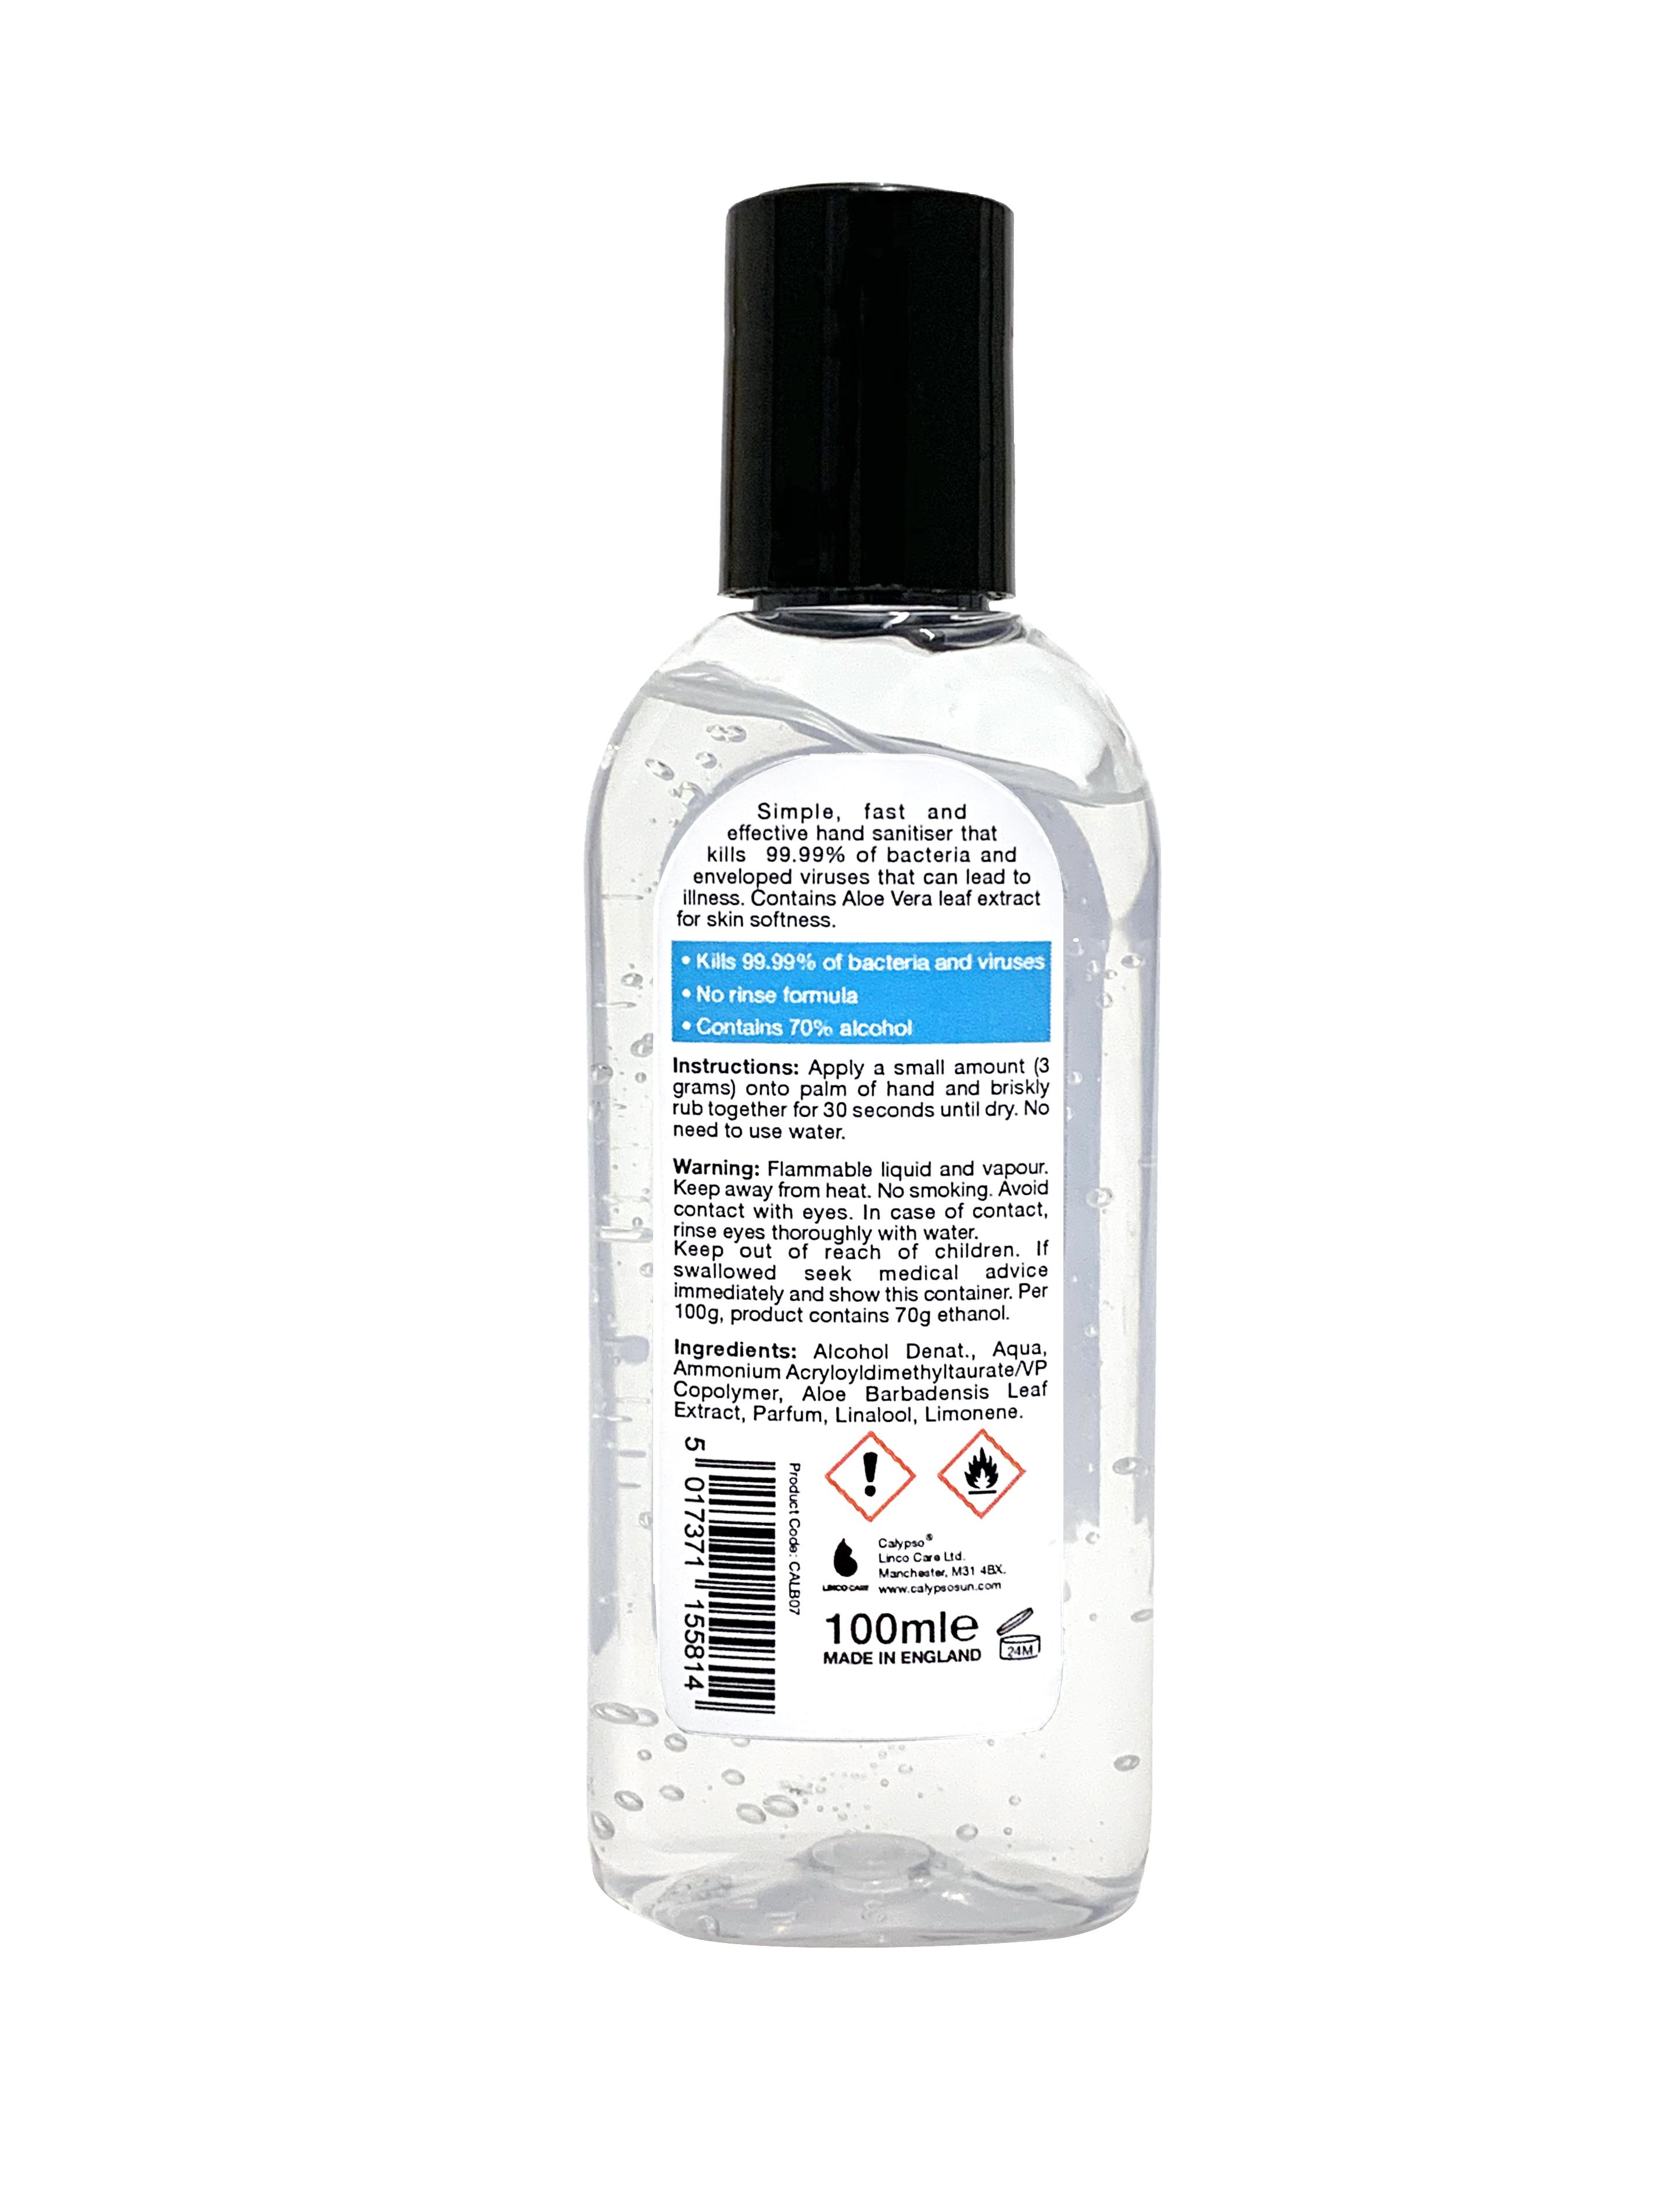 Calypso Hand Hygiene Spray 100ml back label